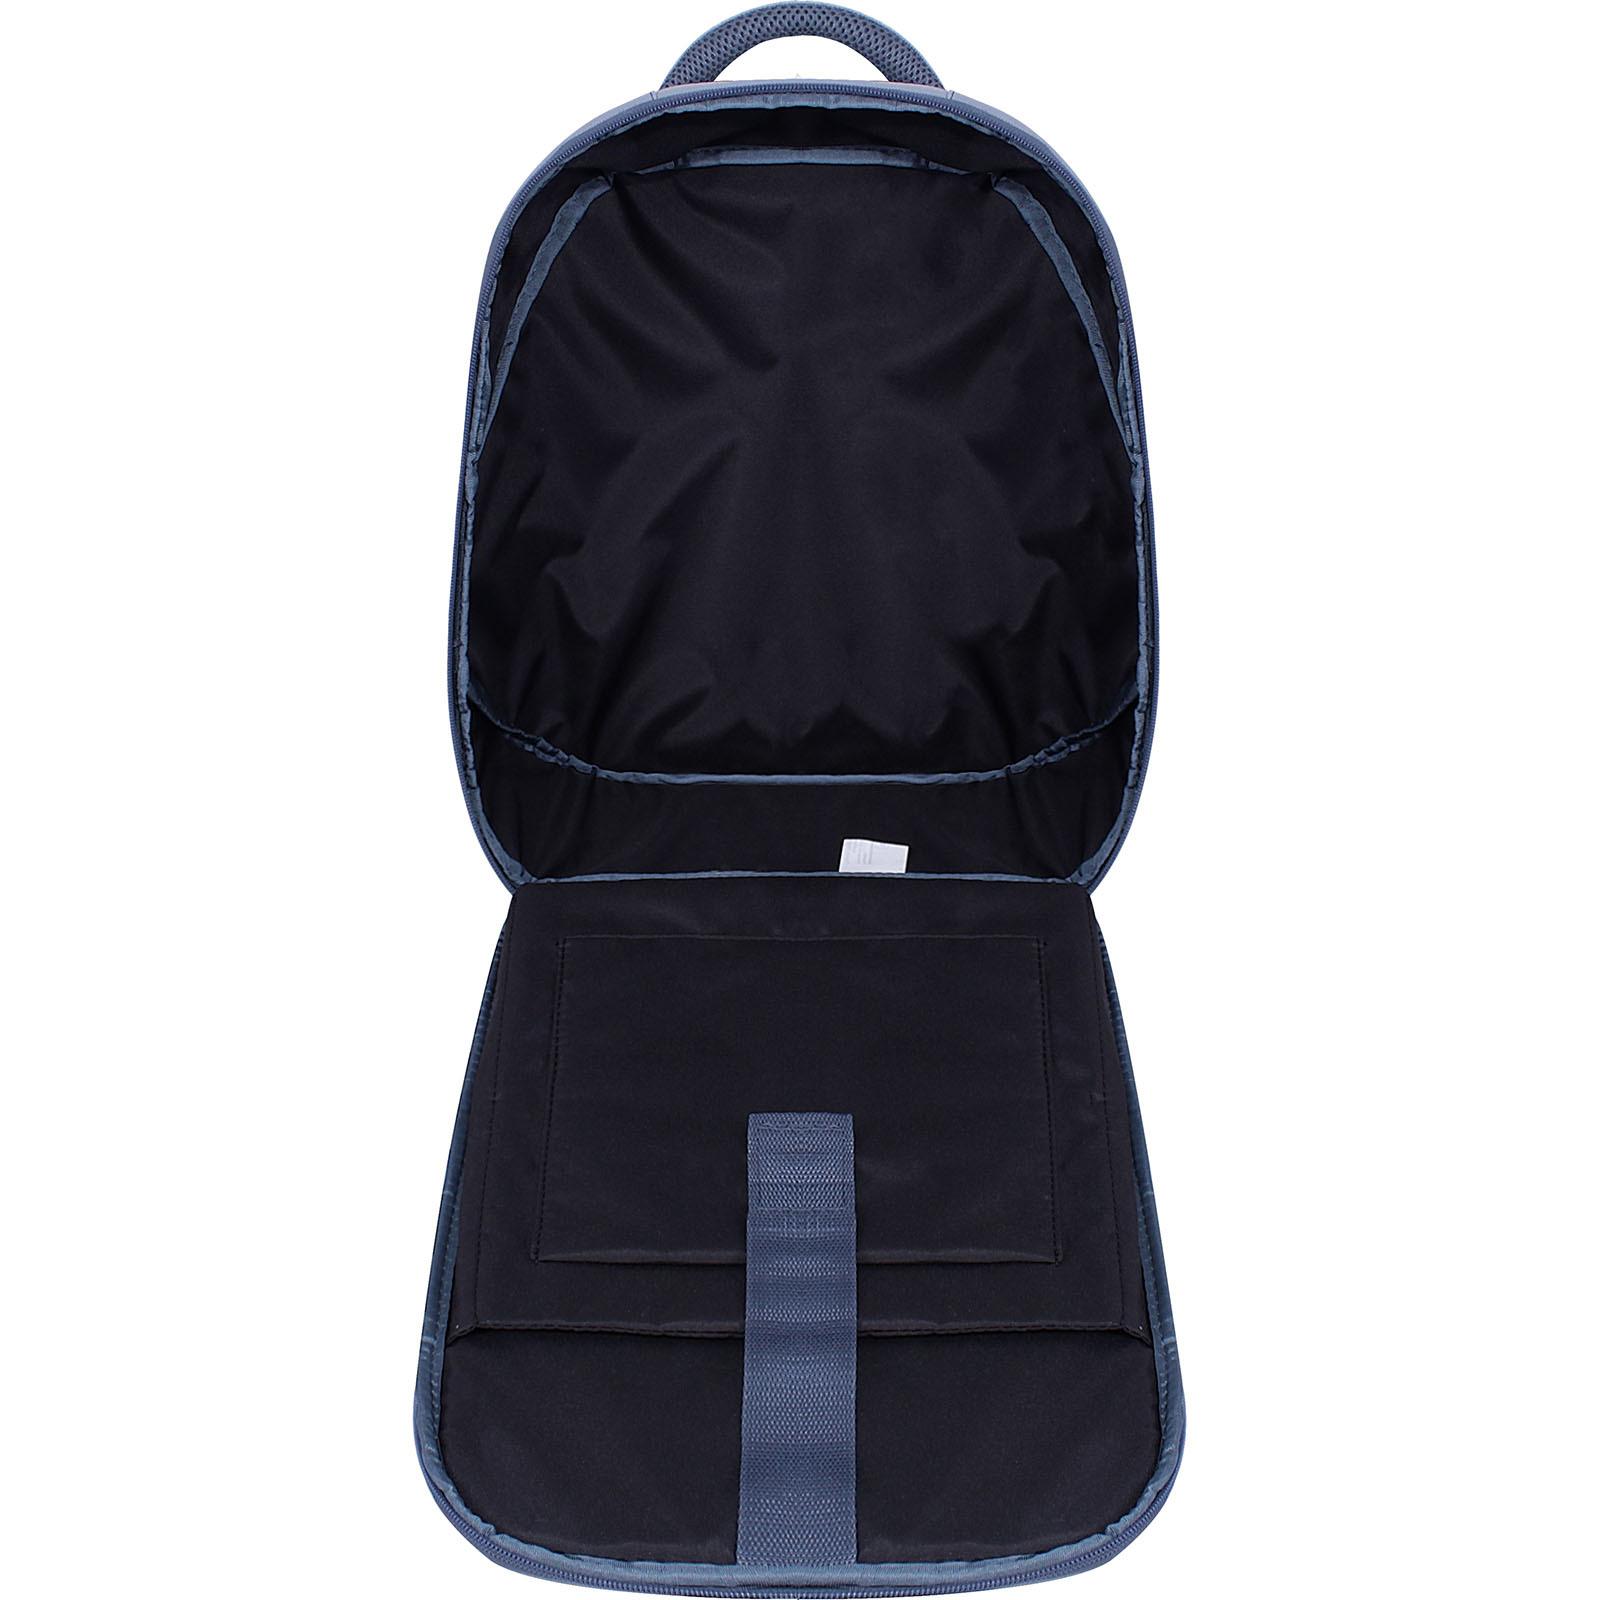 Рюкзак для ноутбука Bagland Shine 16 л. Серый (0058166) фото 4